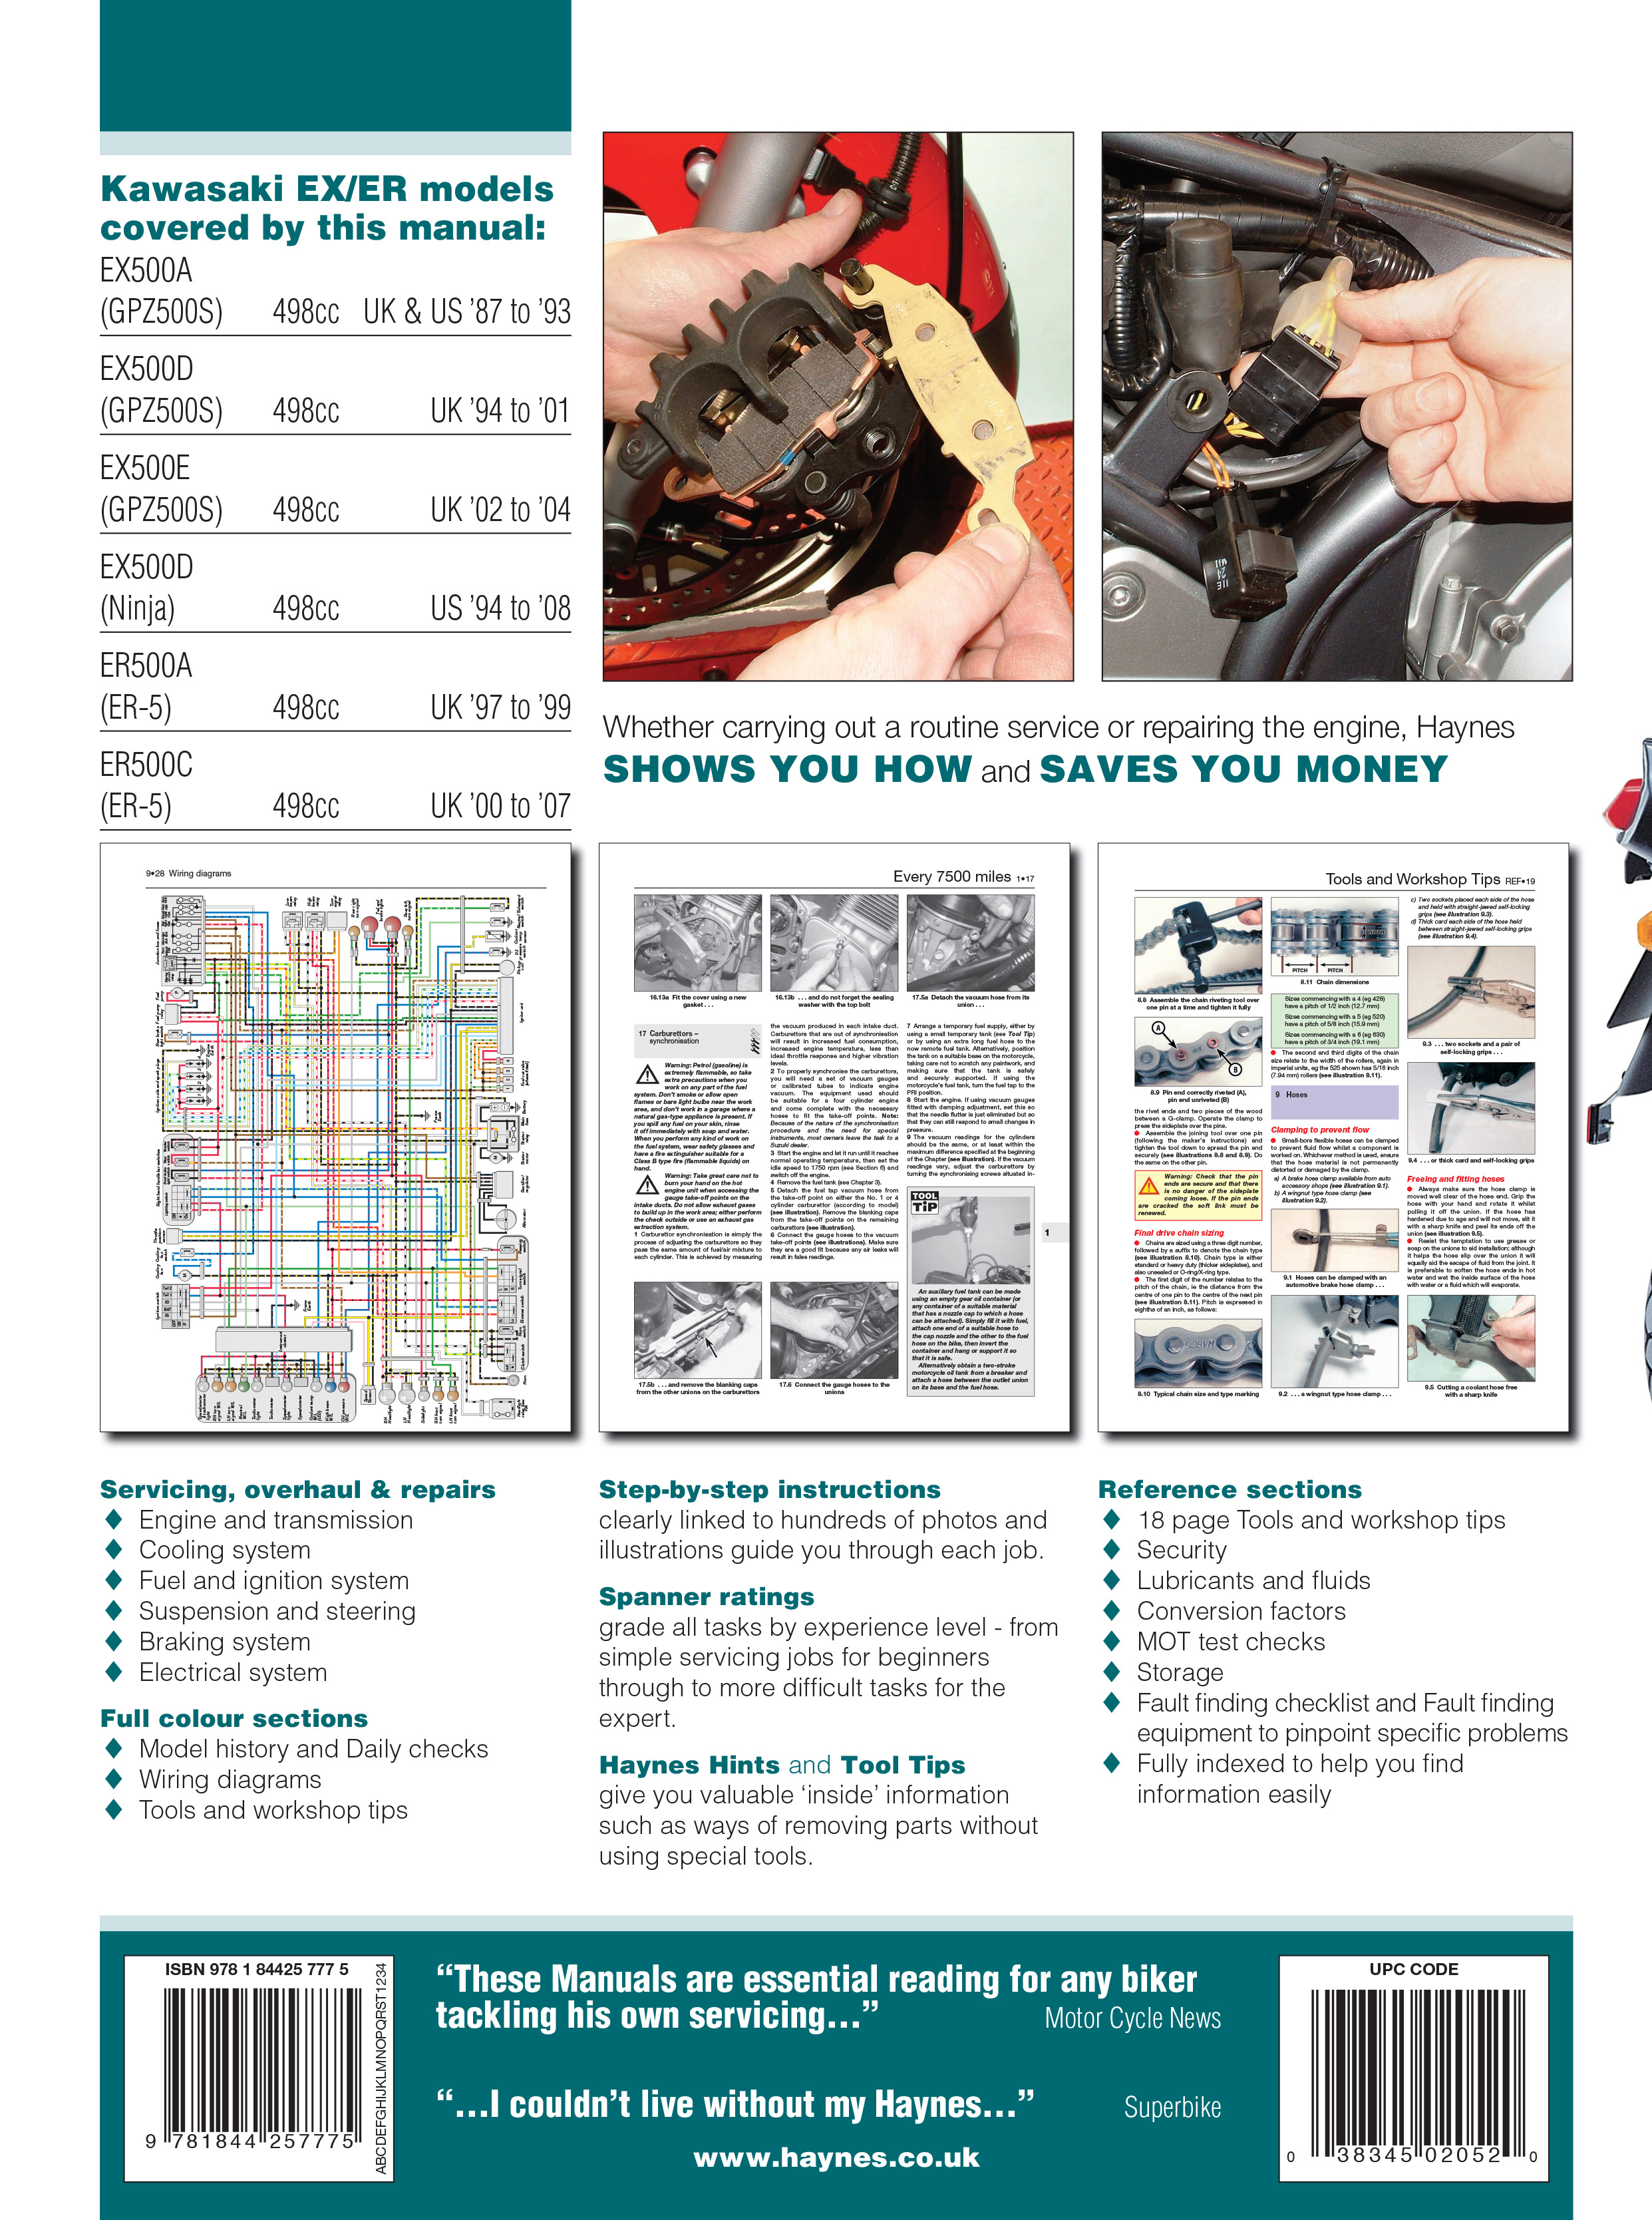 Kawasaki Er 500 Wiring Diagram Library Ex500 03 Diagrams Cb500 Twin Gpz500s Er500 5 87 08